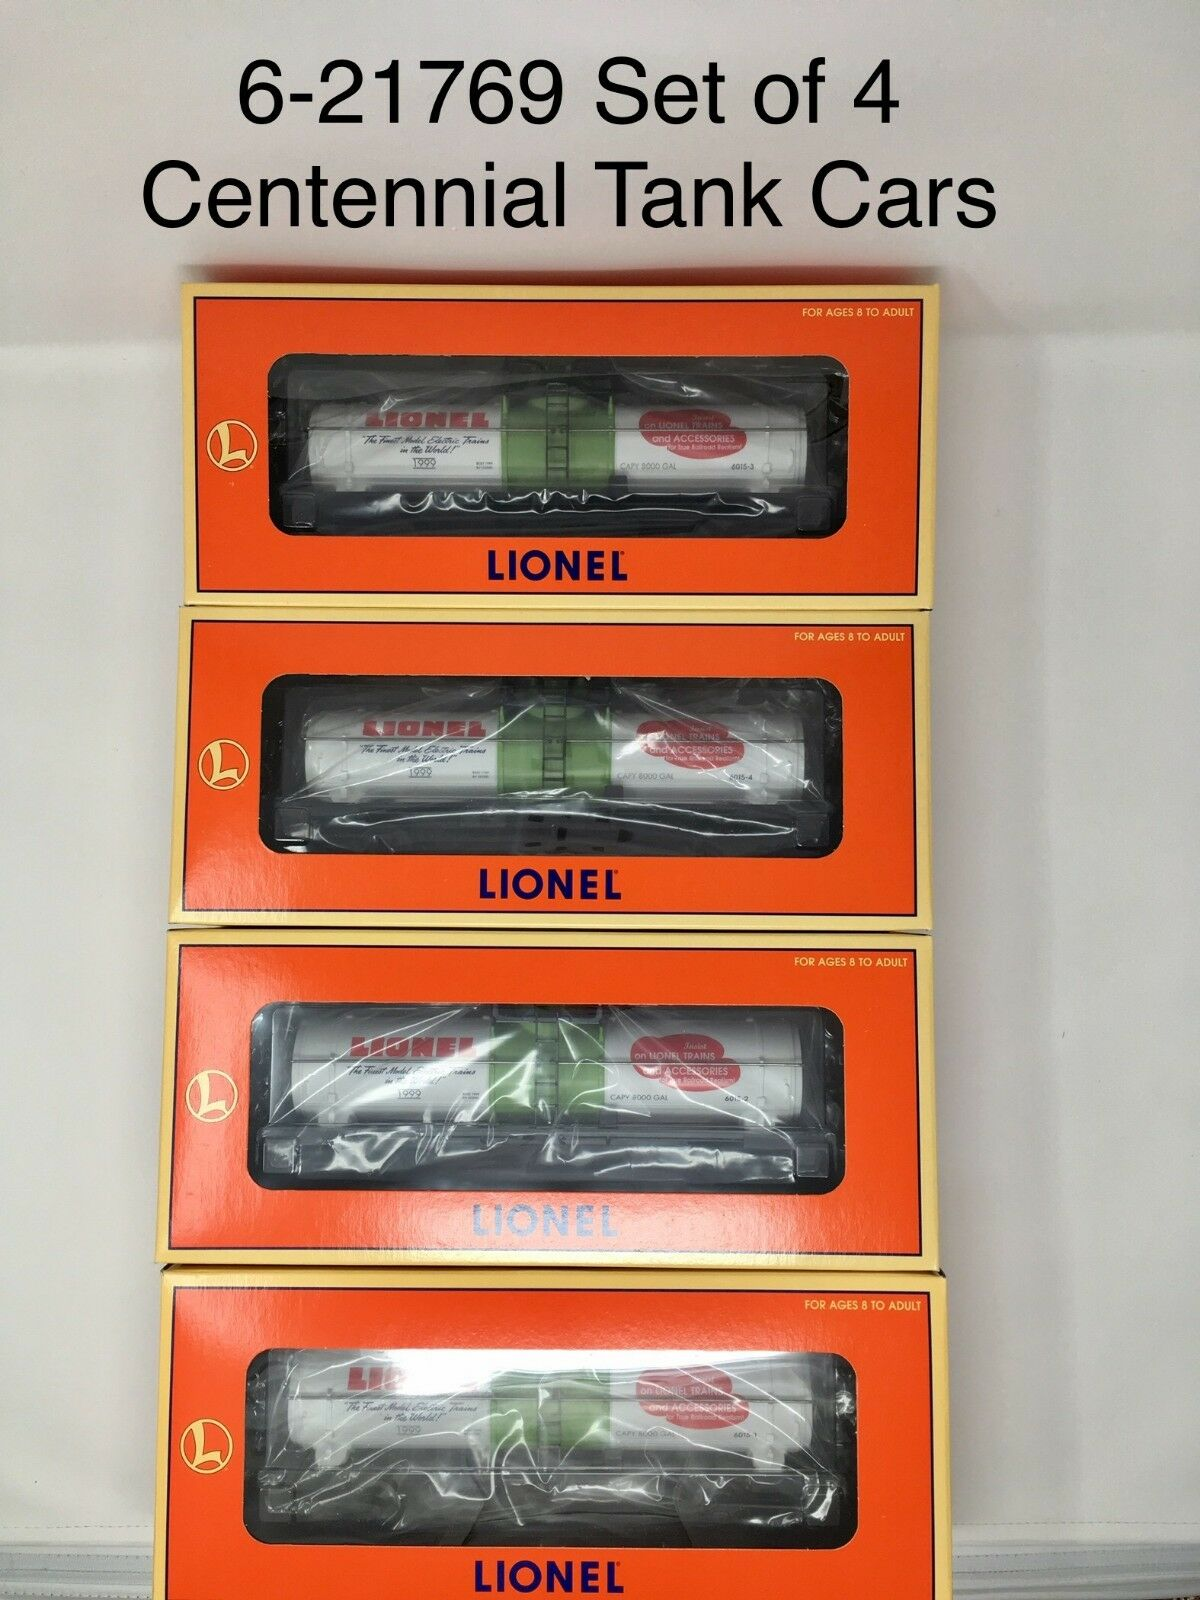 LIONEL 6-21769 Set of 4 Centennial Tank Cars 19621 19622 19623 19624 O Gauge